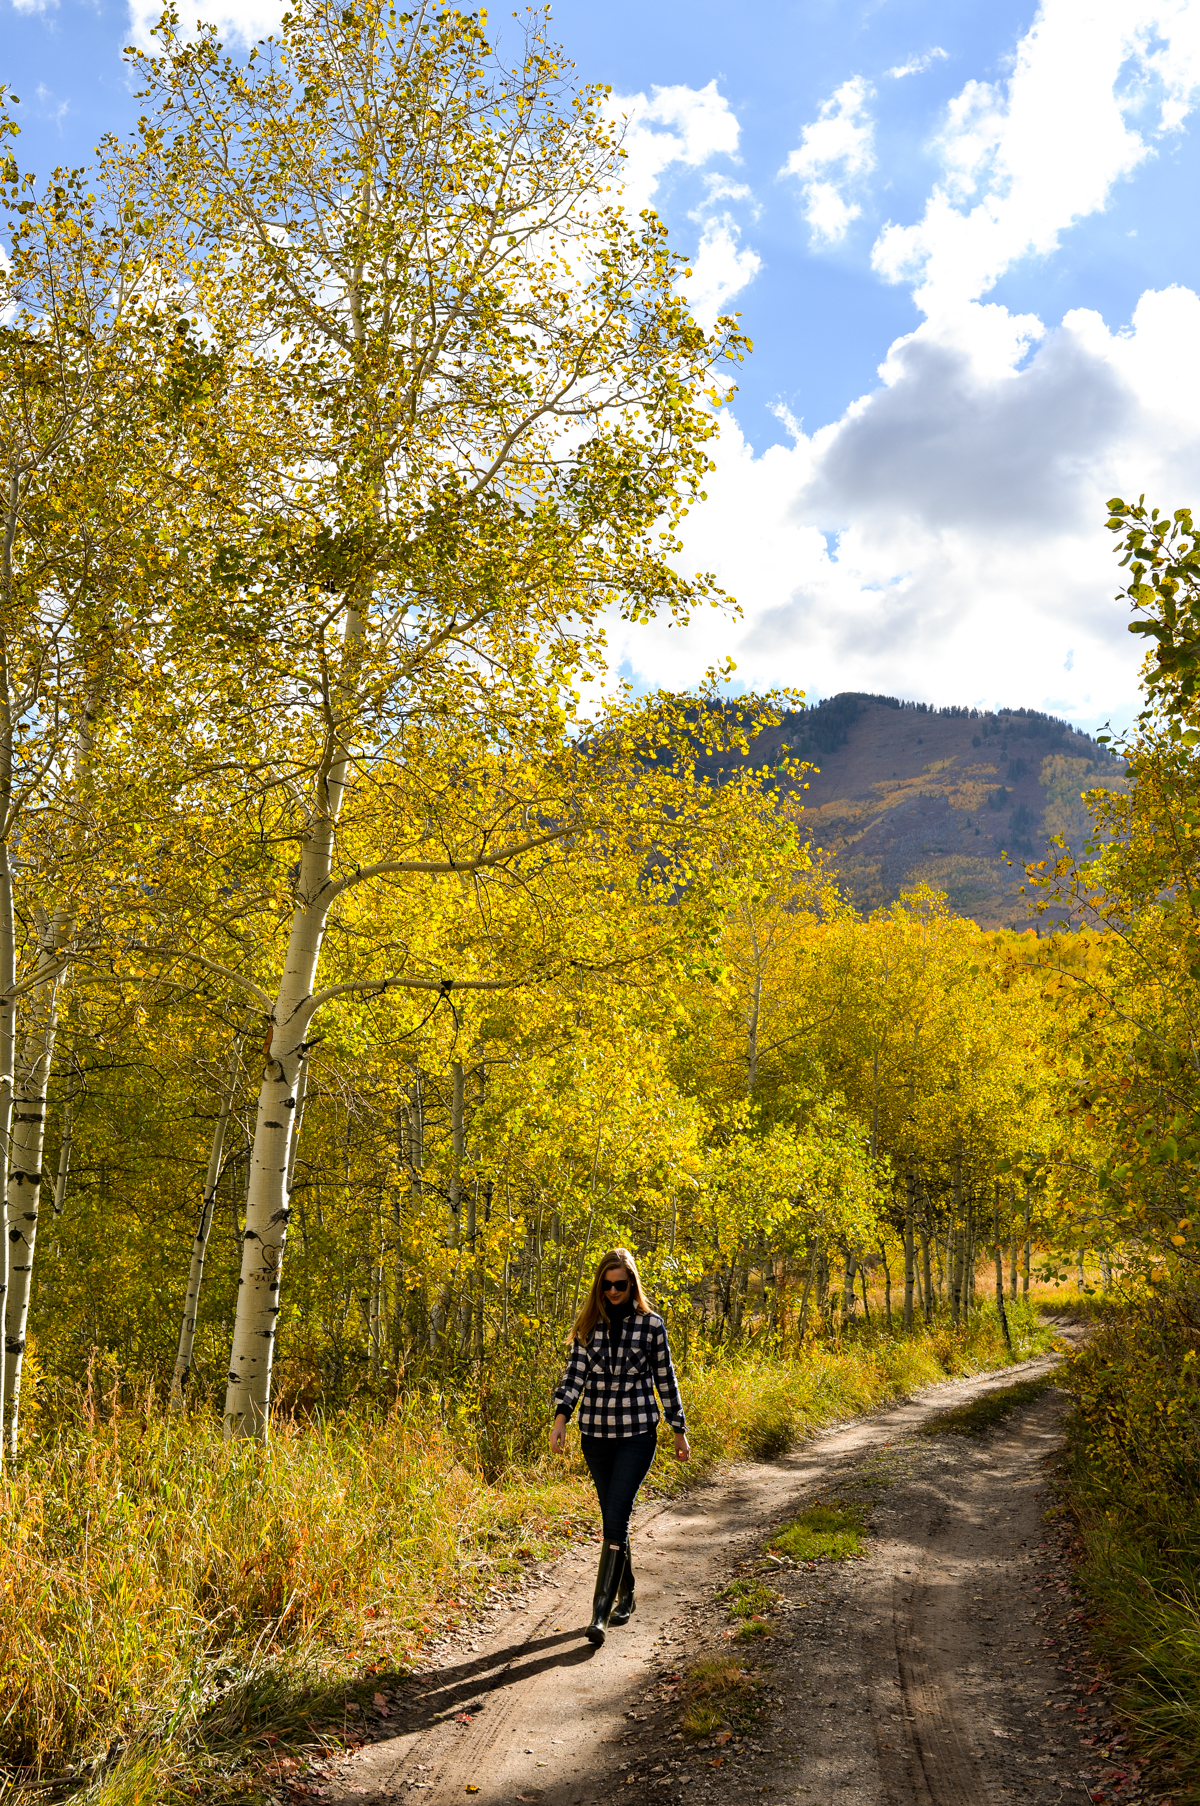 Stacie Flinner Fall Foliage in Utah